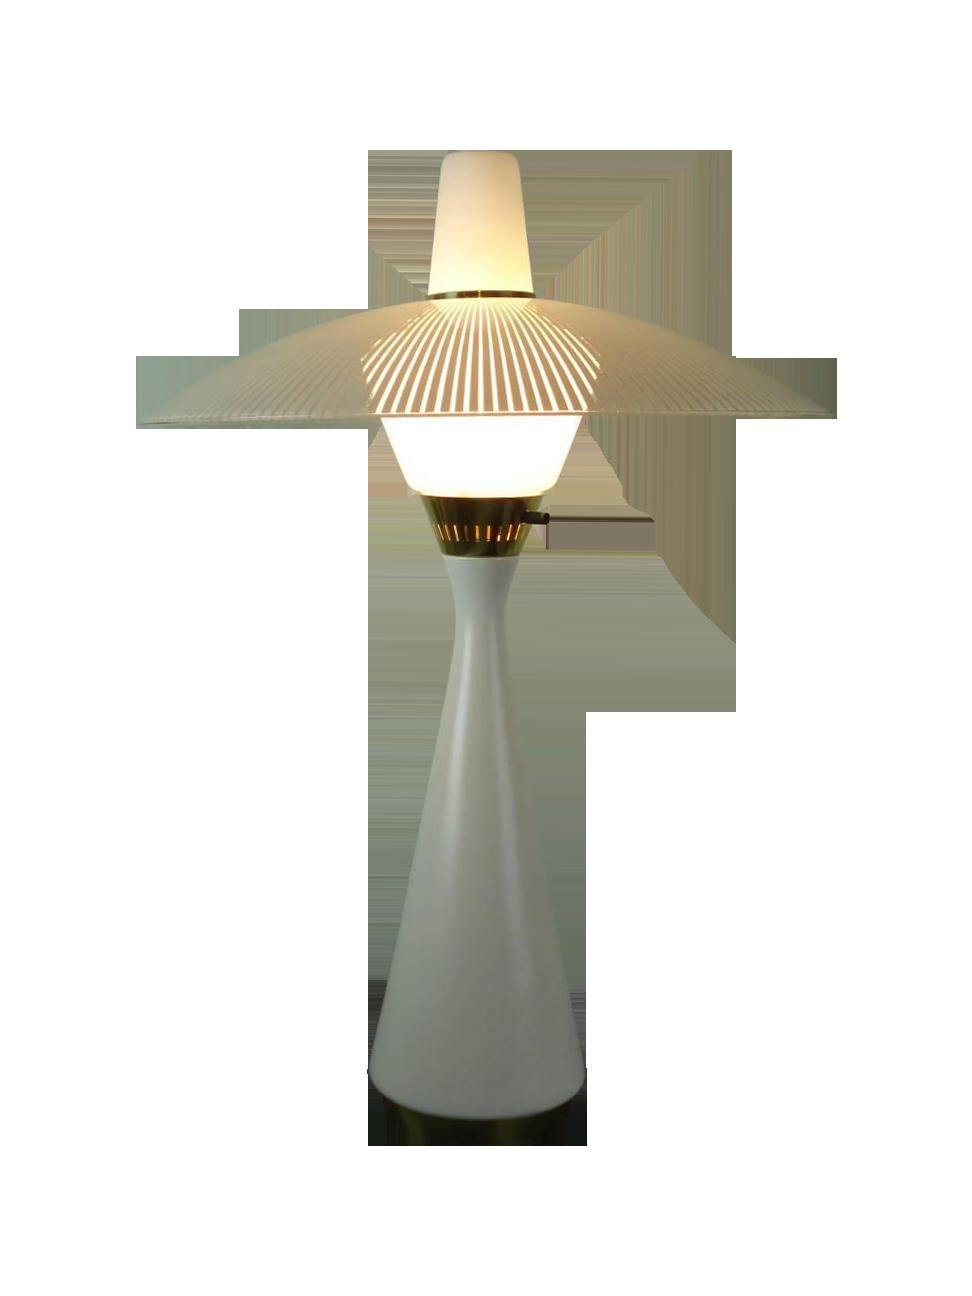 Gerald thurston lightolier scandia table lamp chairish geotapseo Image collections